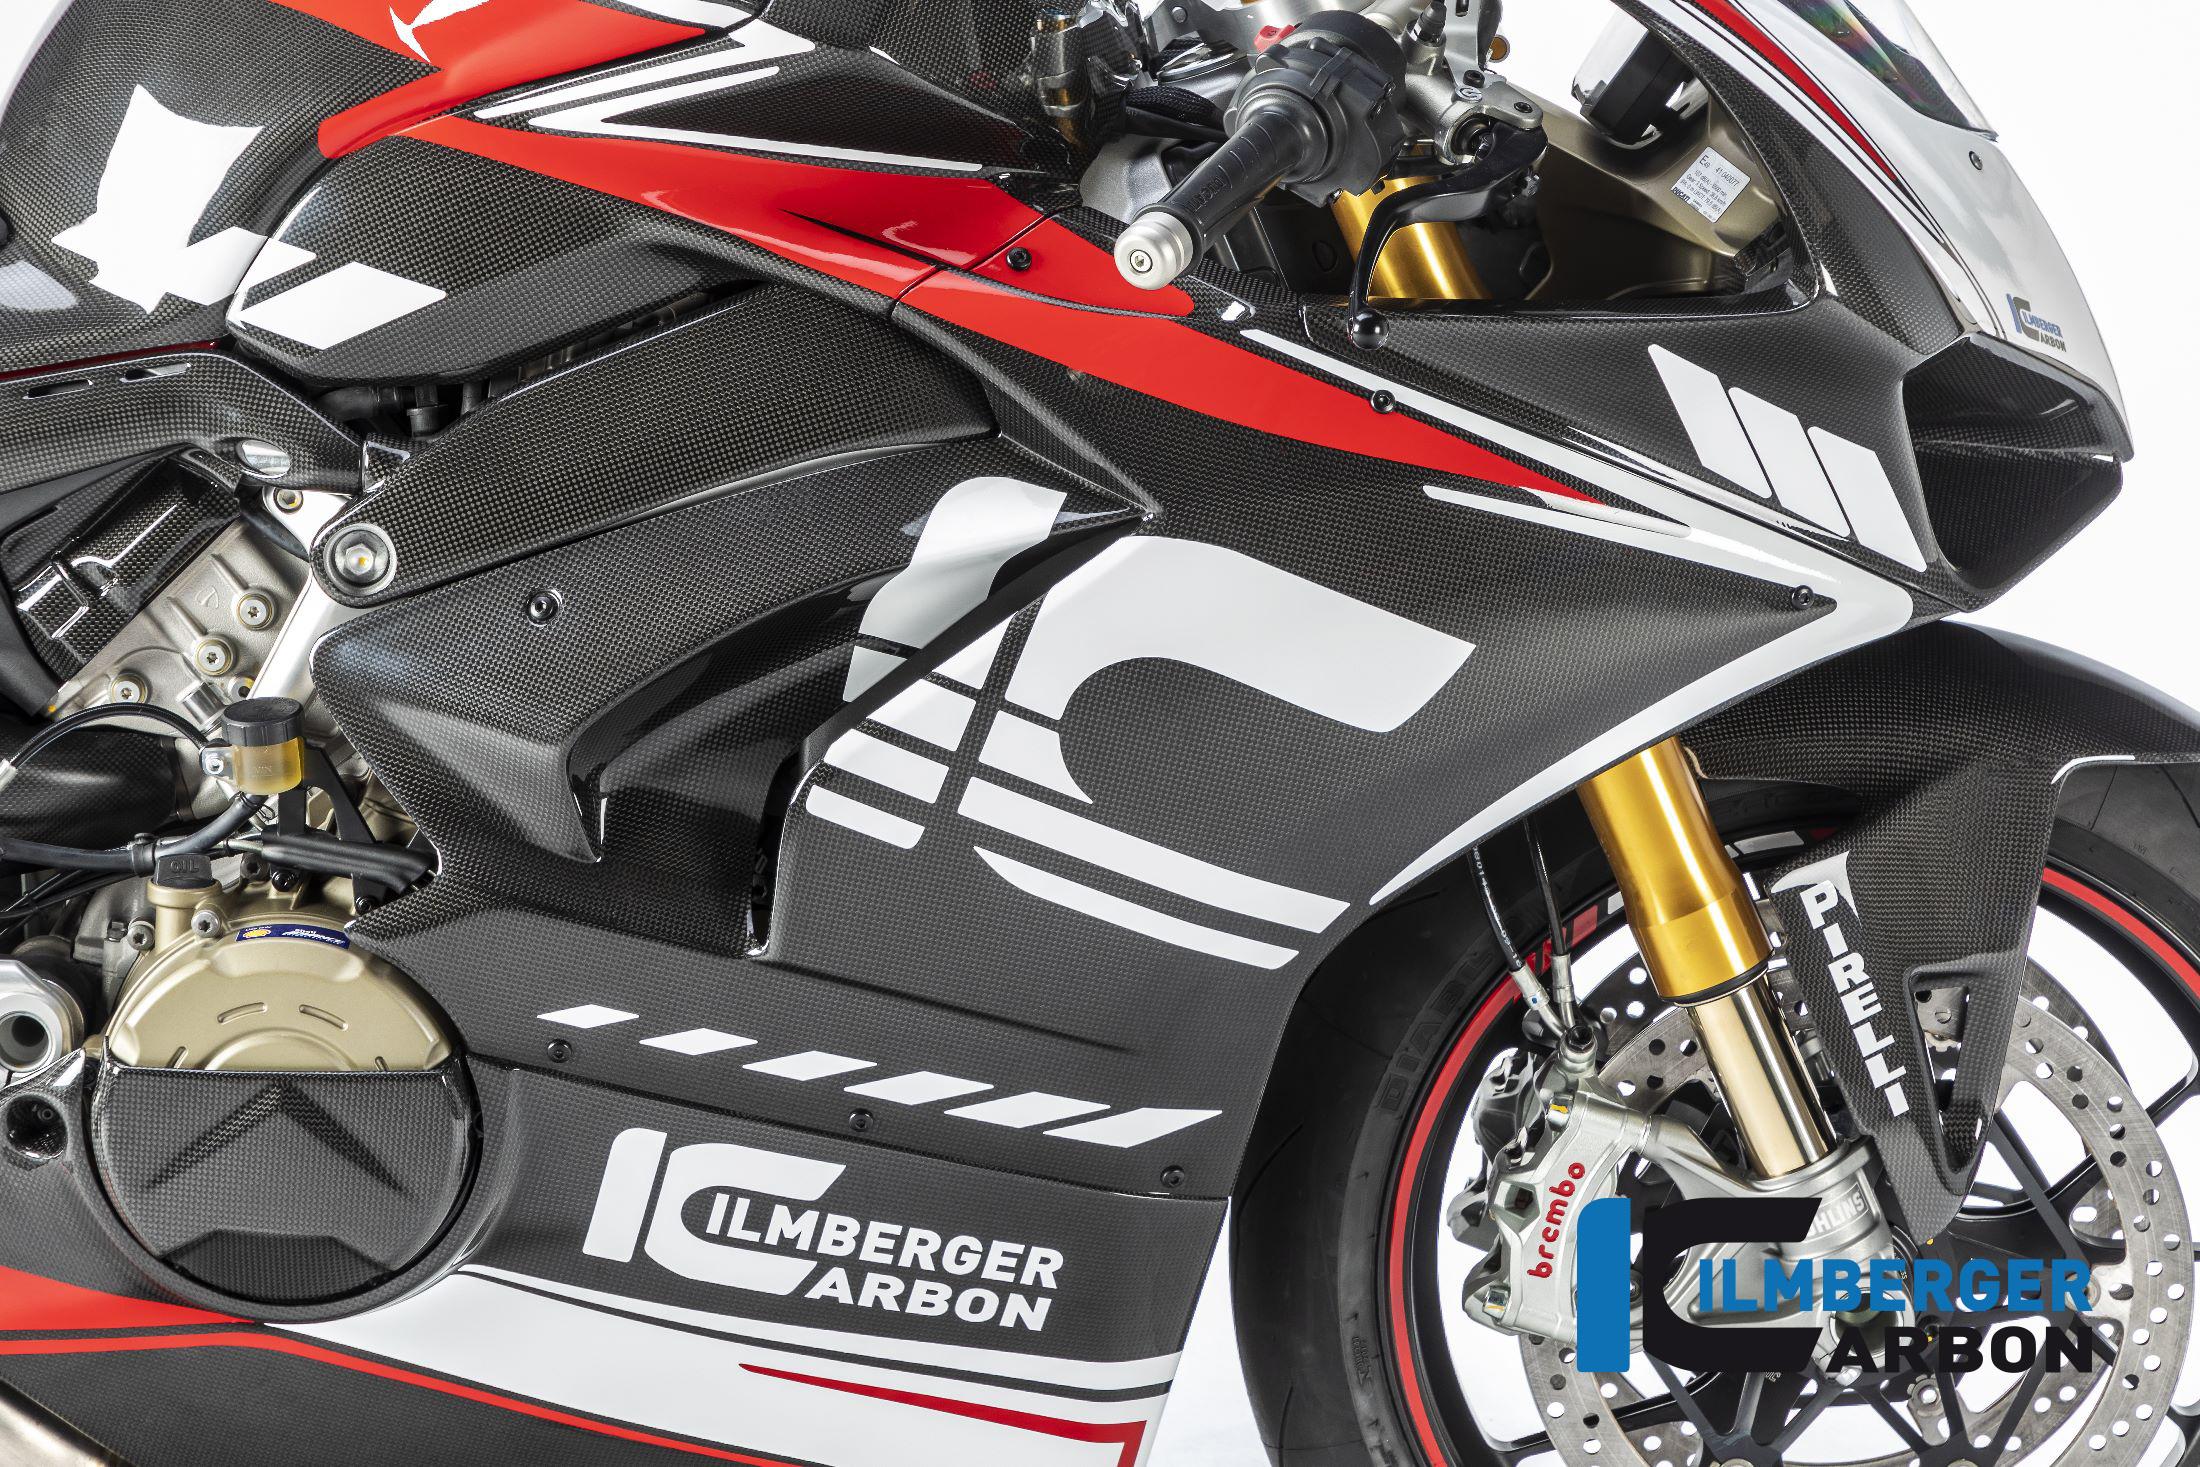 Ducati_Panigale_V4_Carbon_Ilmberger_226.jpg